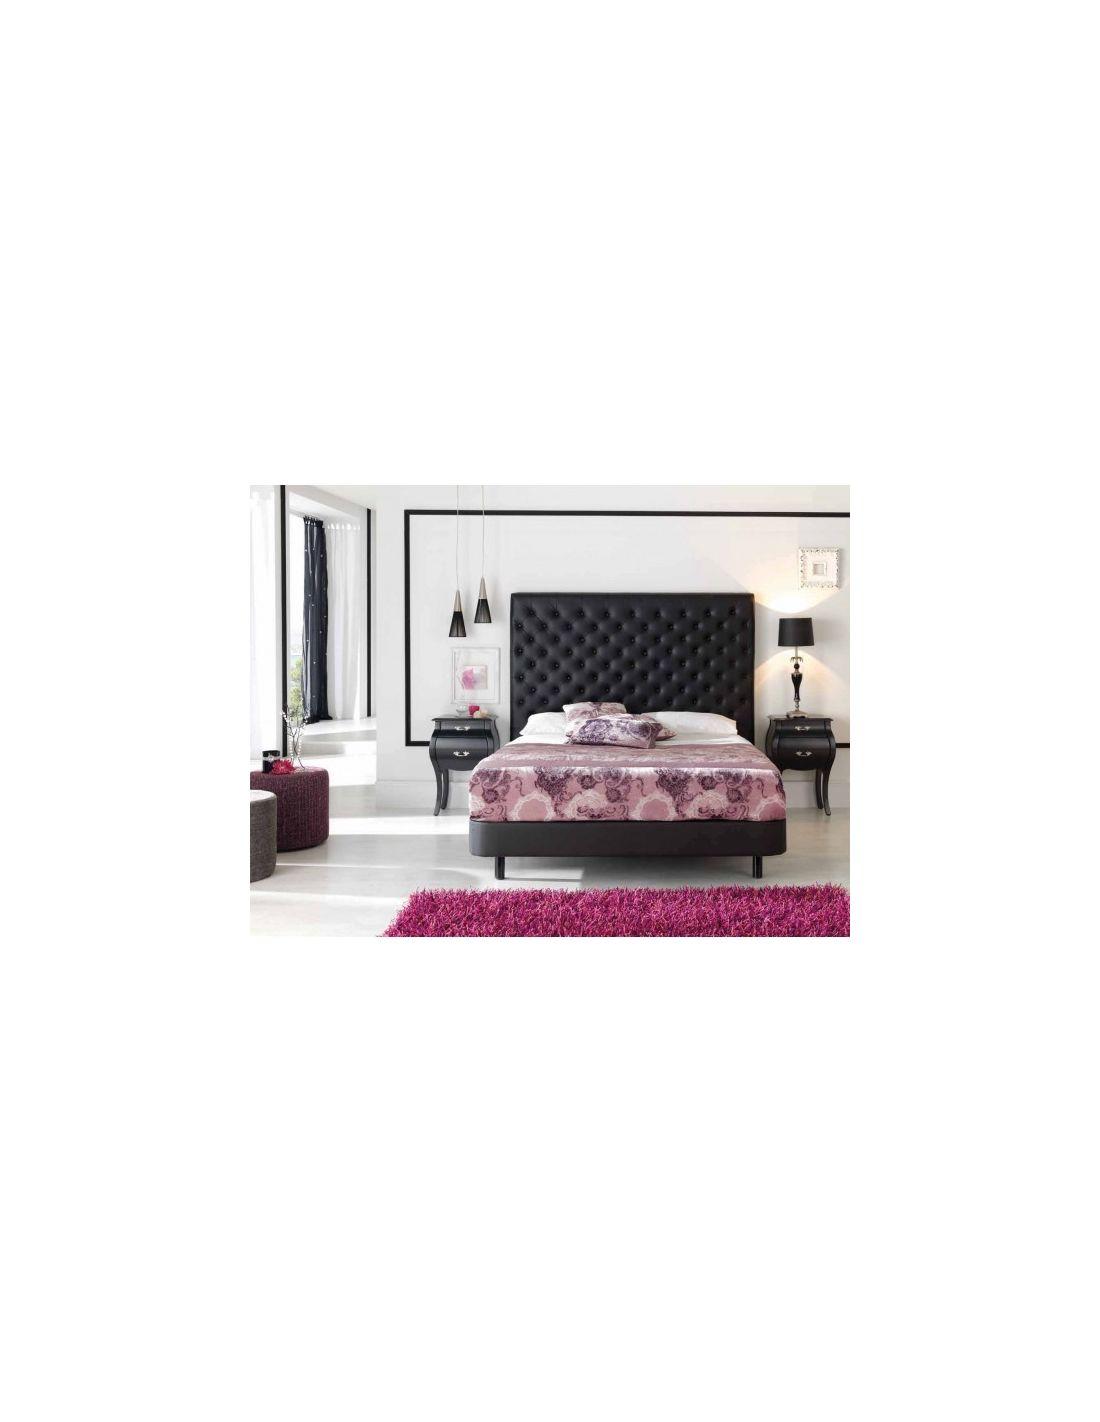 Cabeceros polipiel cabeceros piel cabeceros tapizados cabecero cama moderno cabeceros - Cabeceros para camas ...